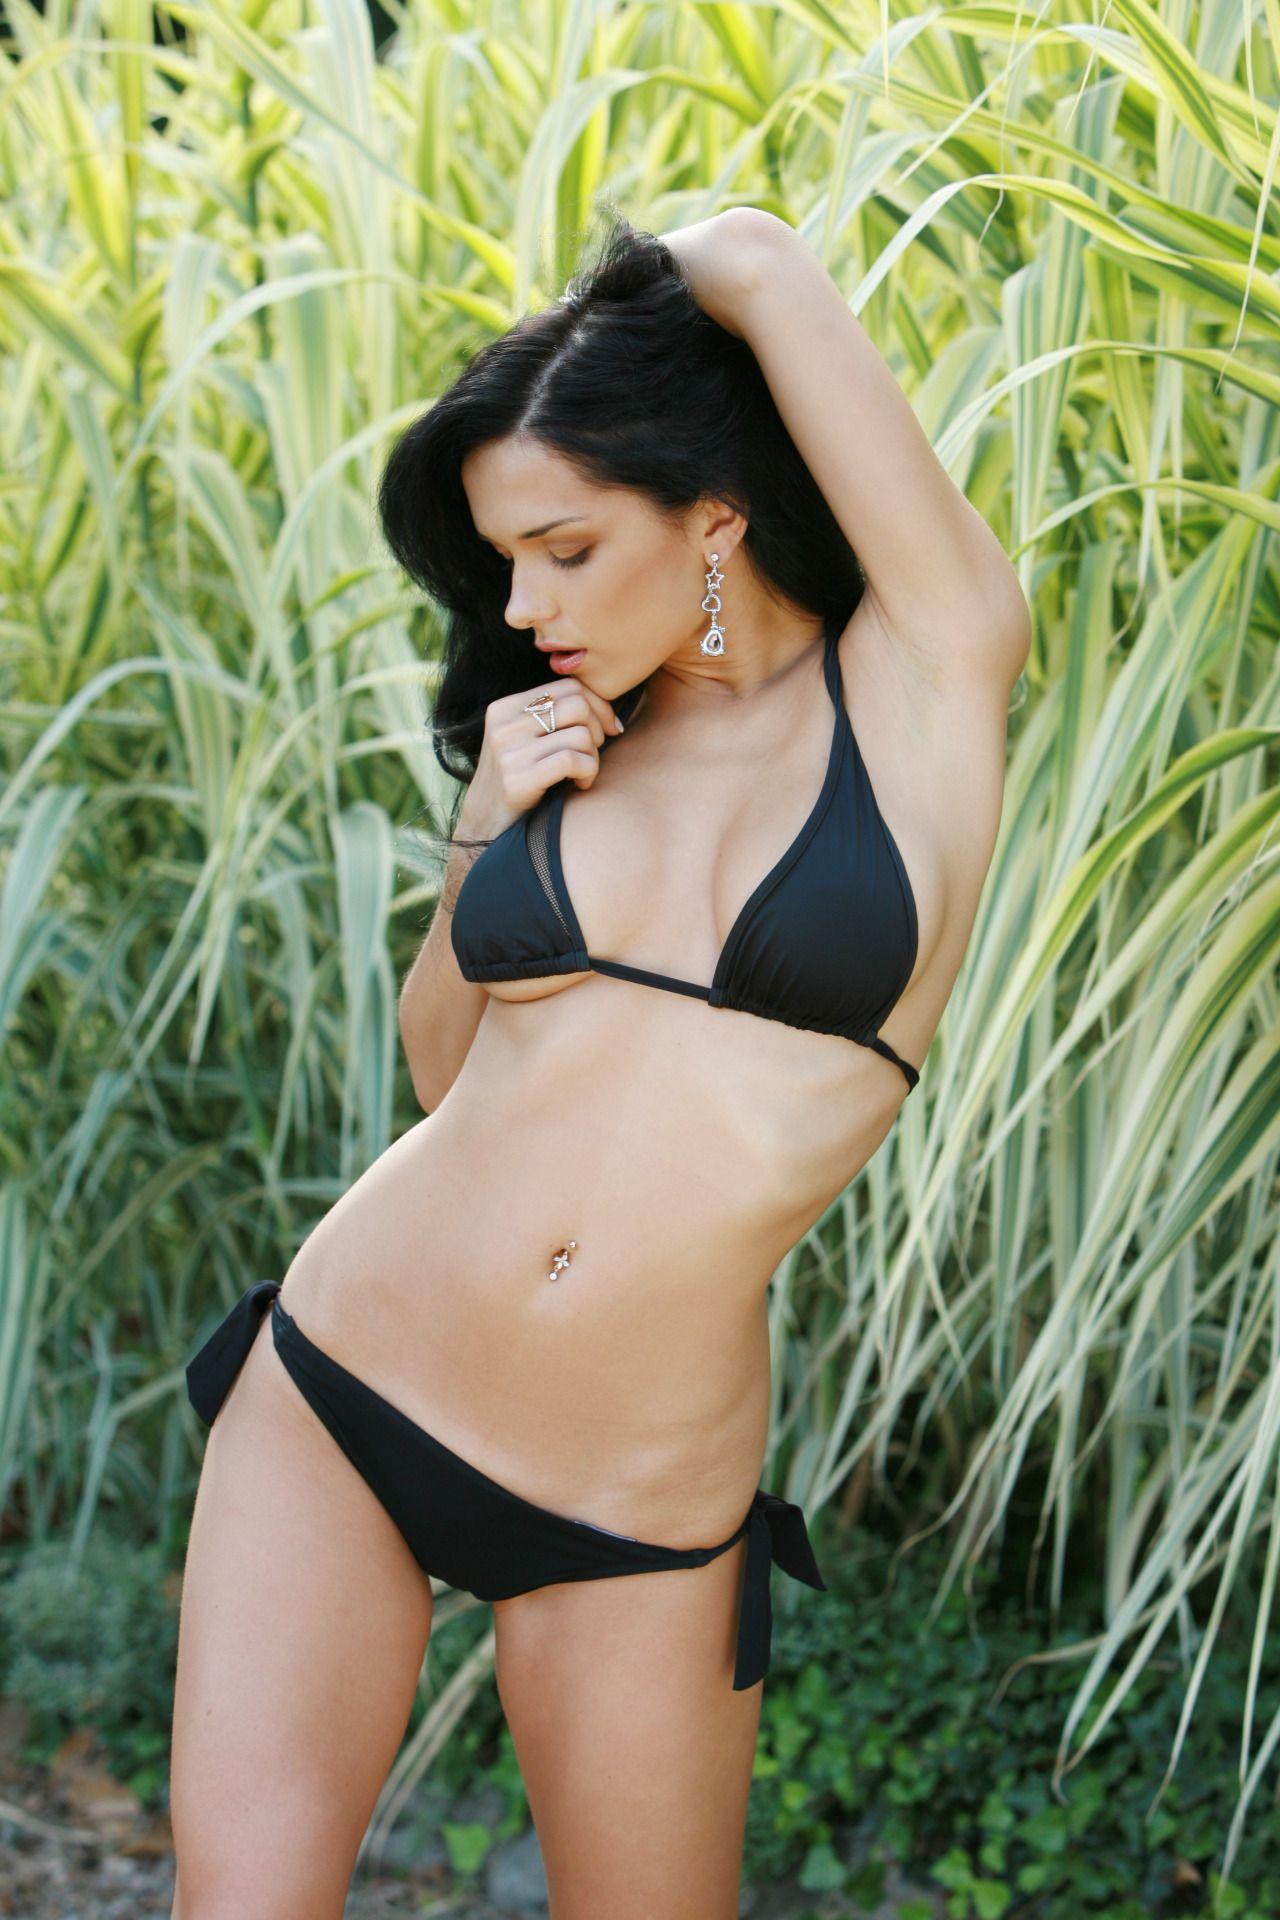 Bikini Jenya D nude photos 2019